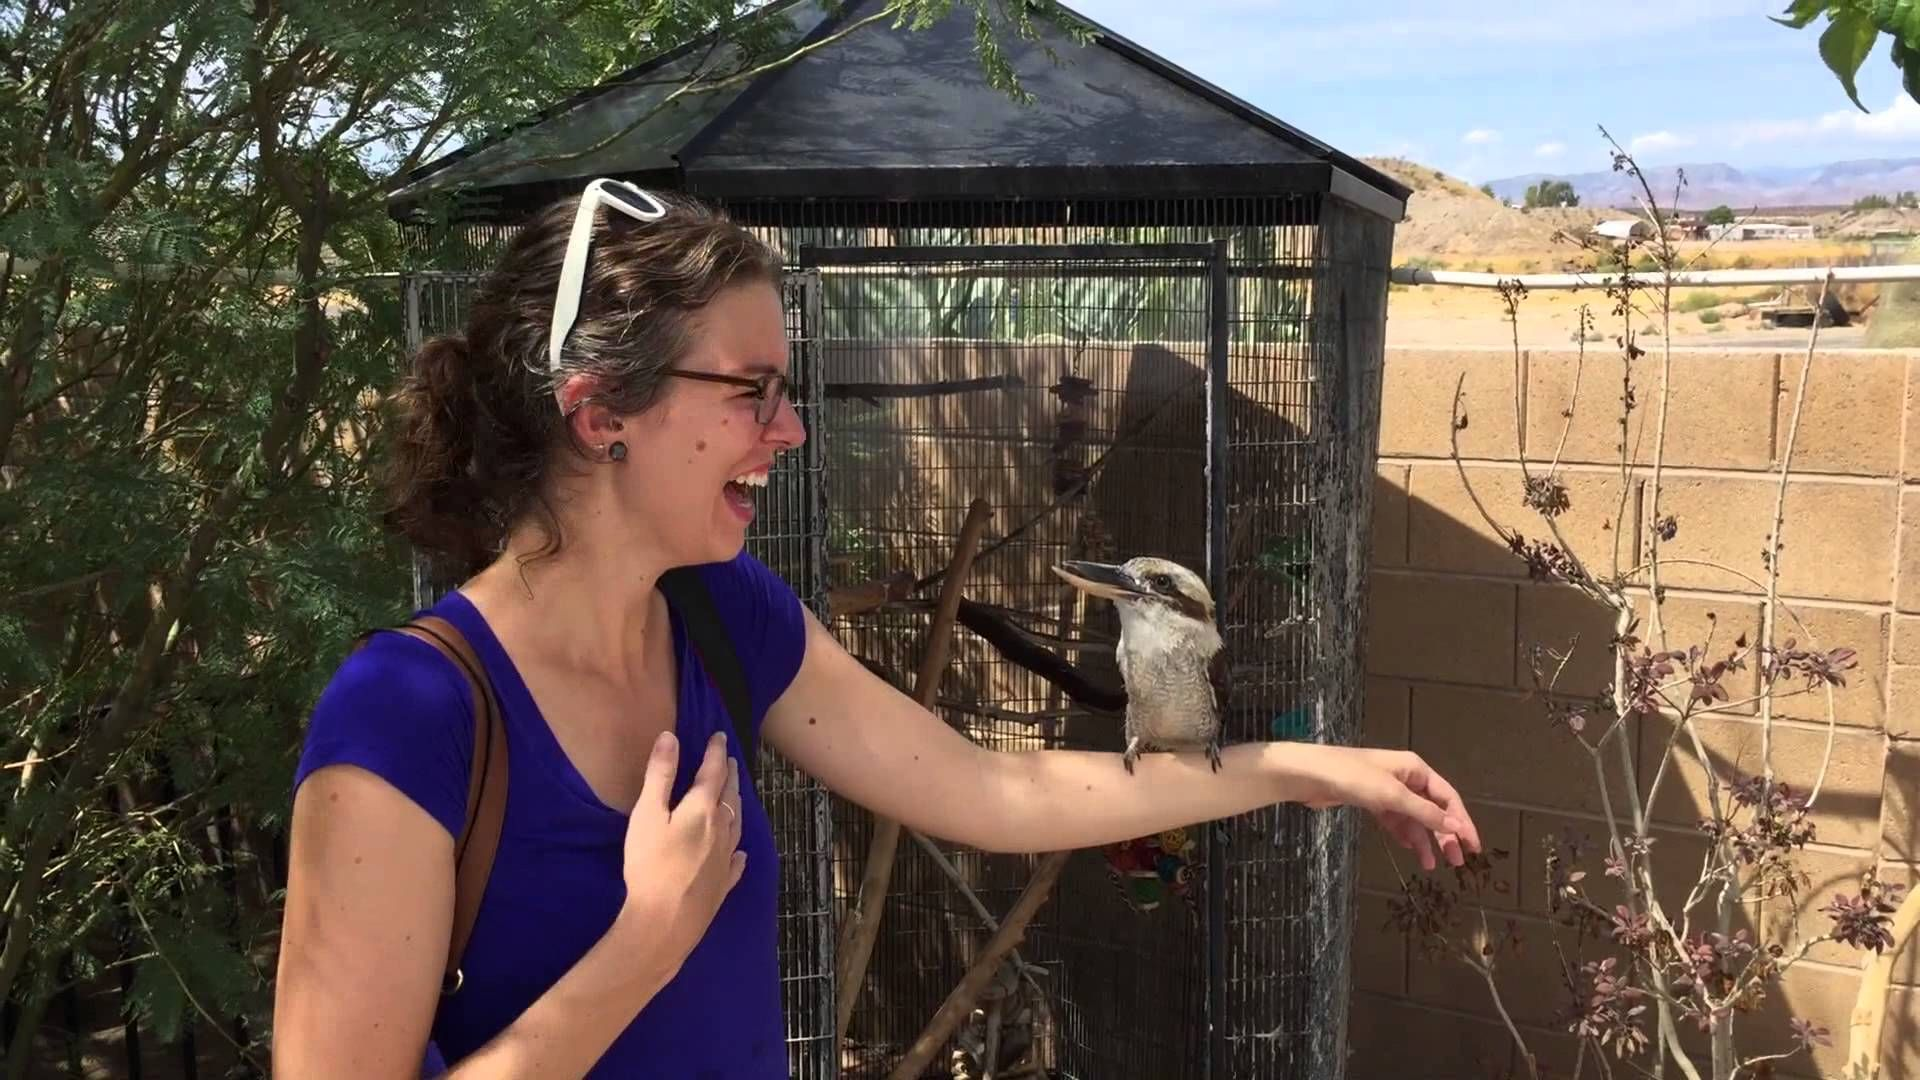 Kookaburra Laughing YouTube Laugh, Animals, Cute animals